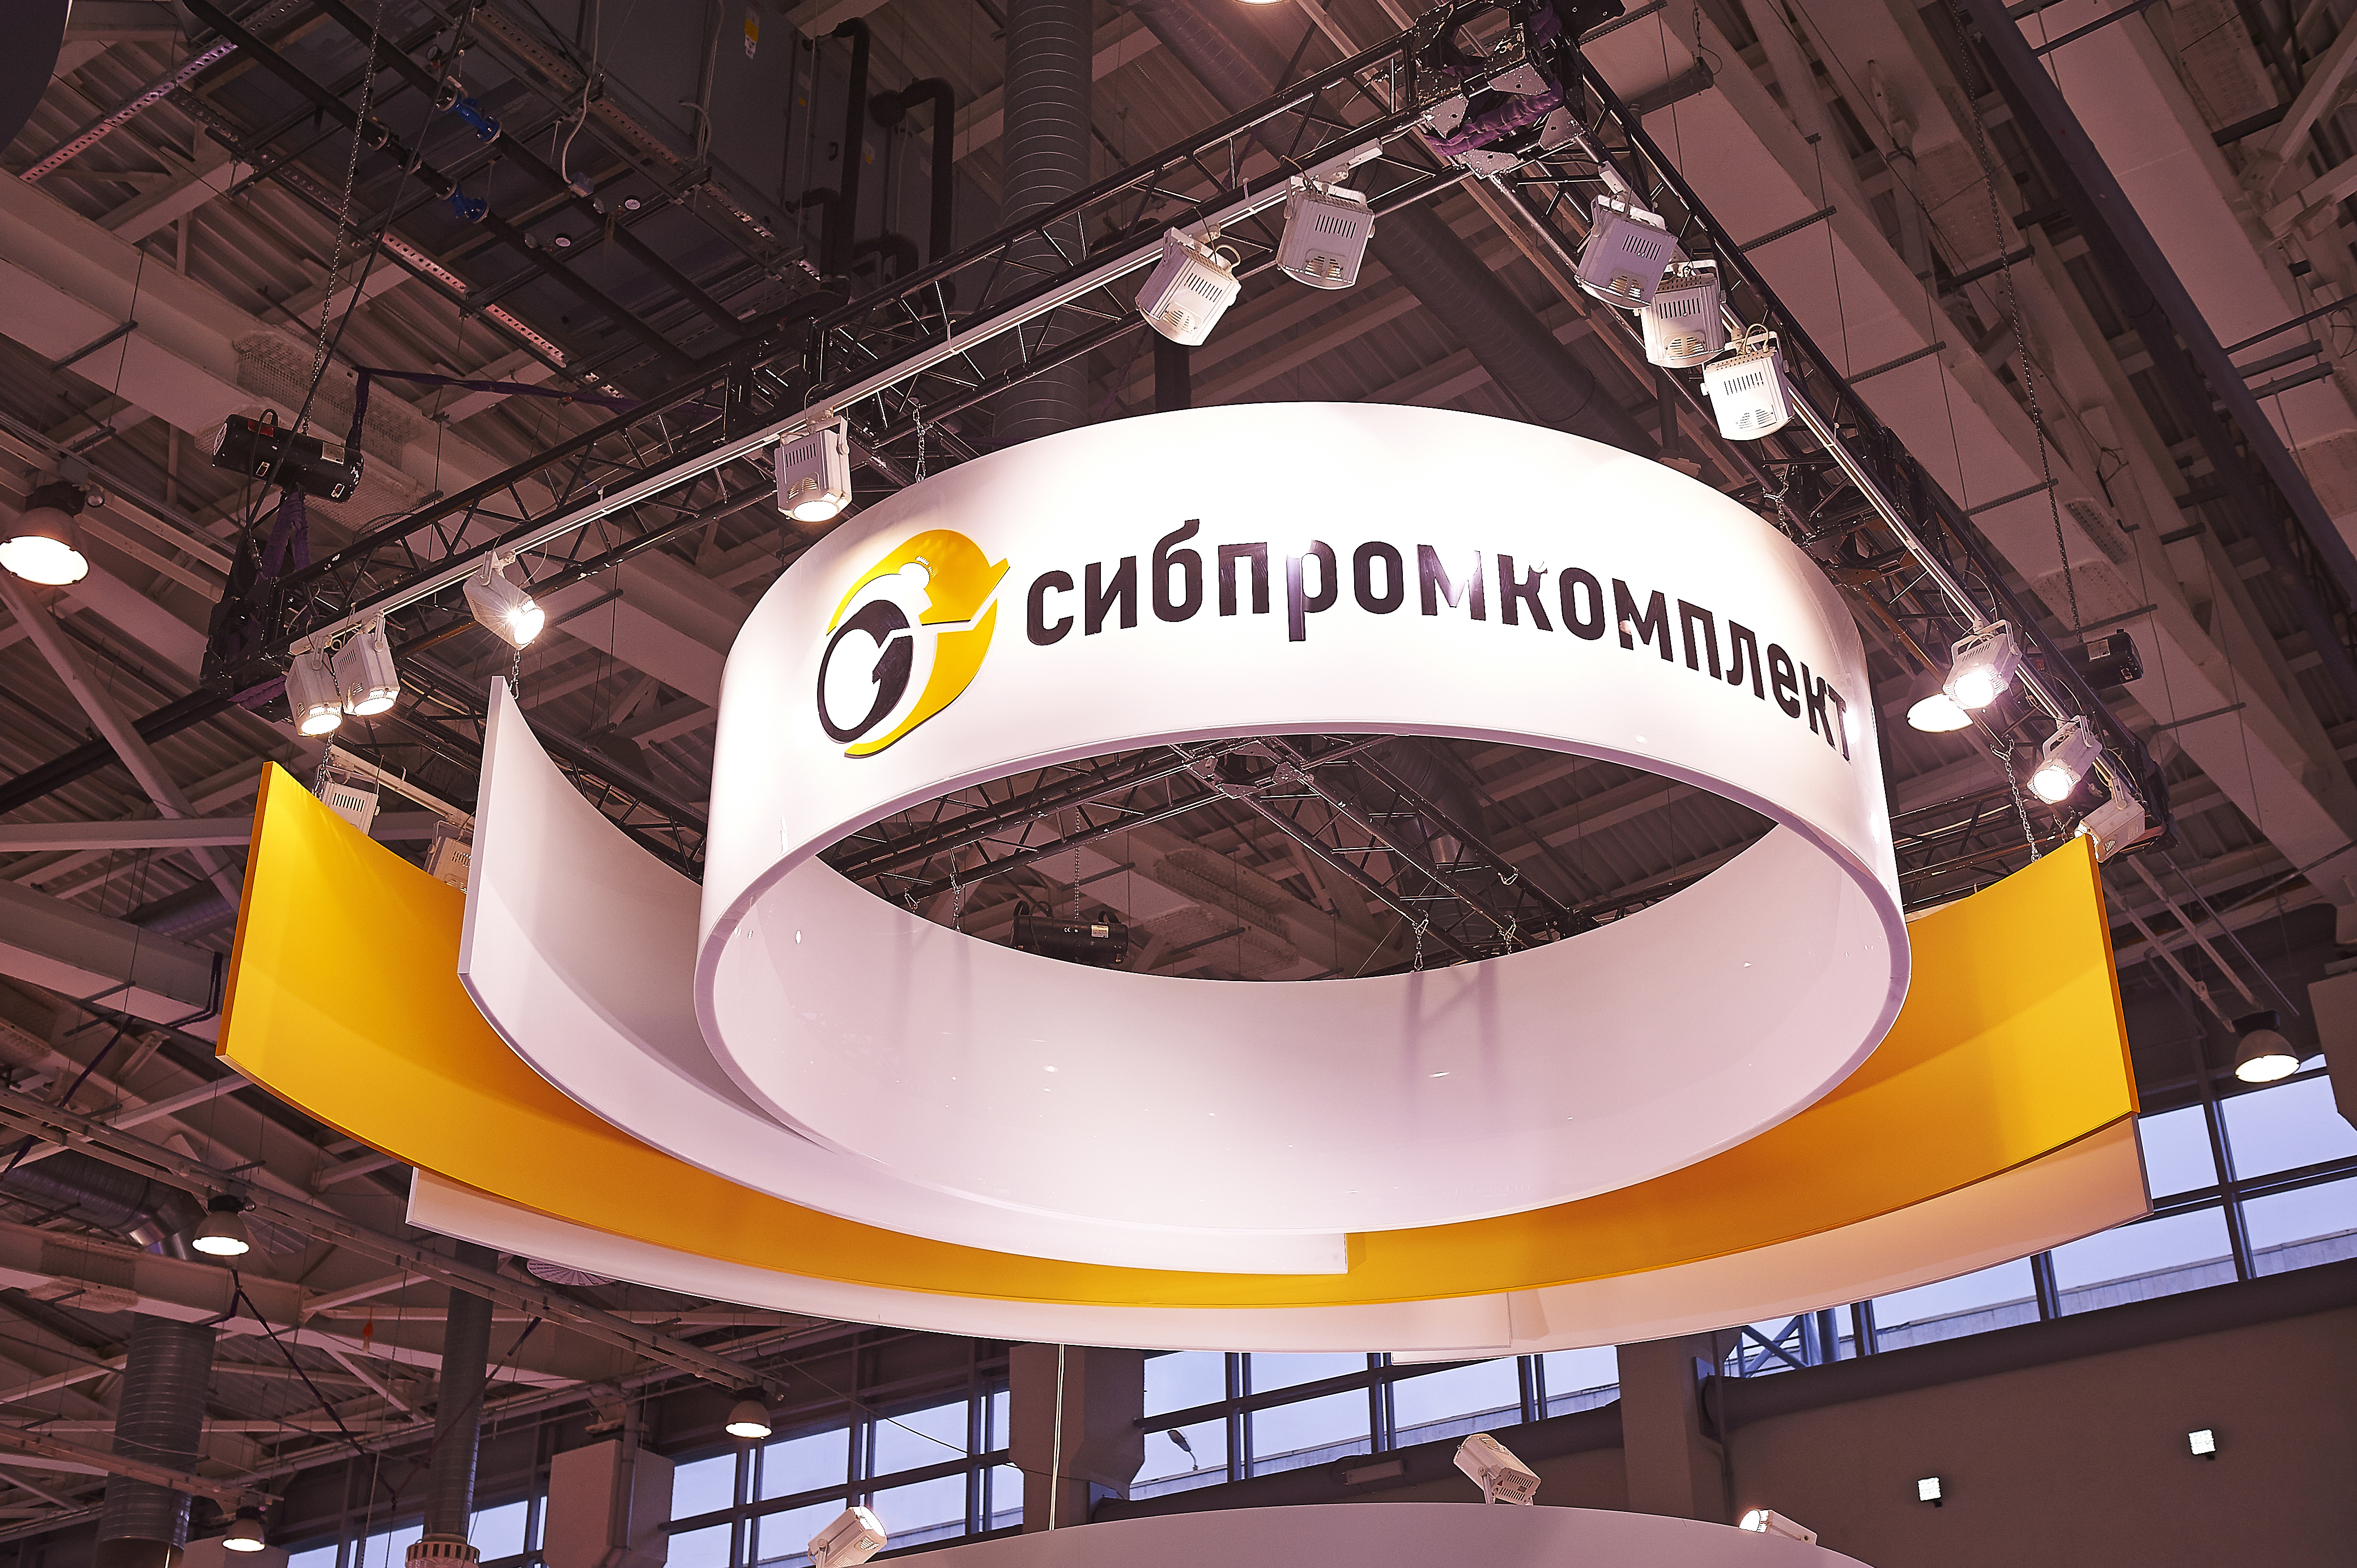 Sibprom_300dpi_20